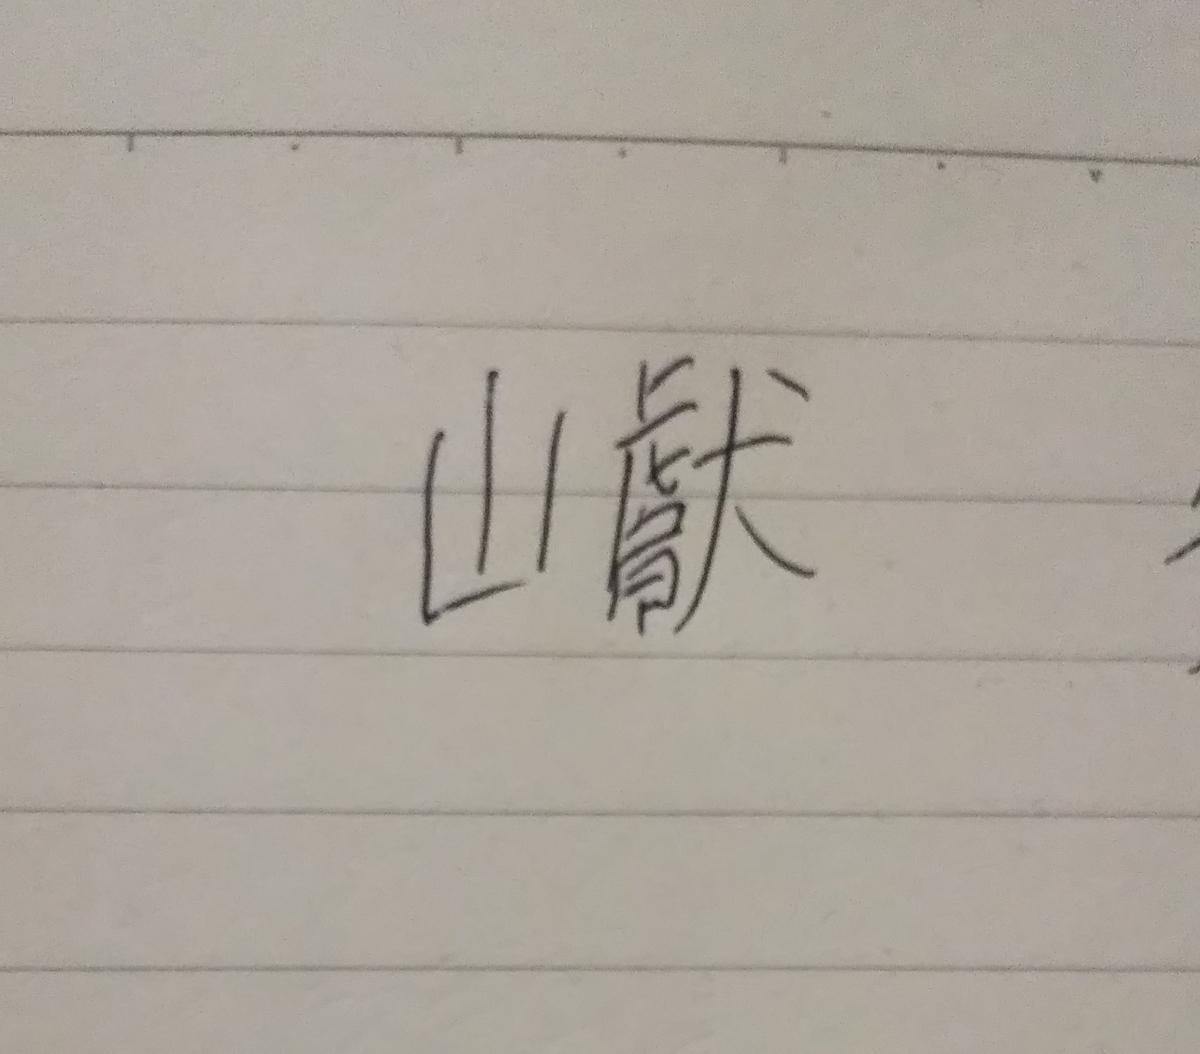 f:id:sakamotoakirax:20191229054127j:plain